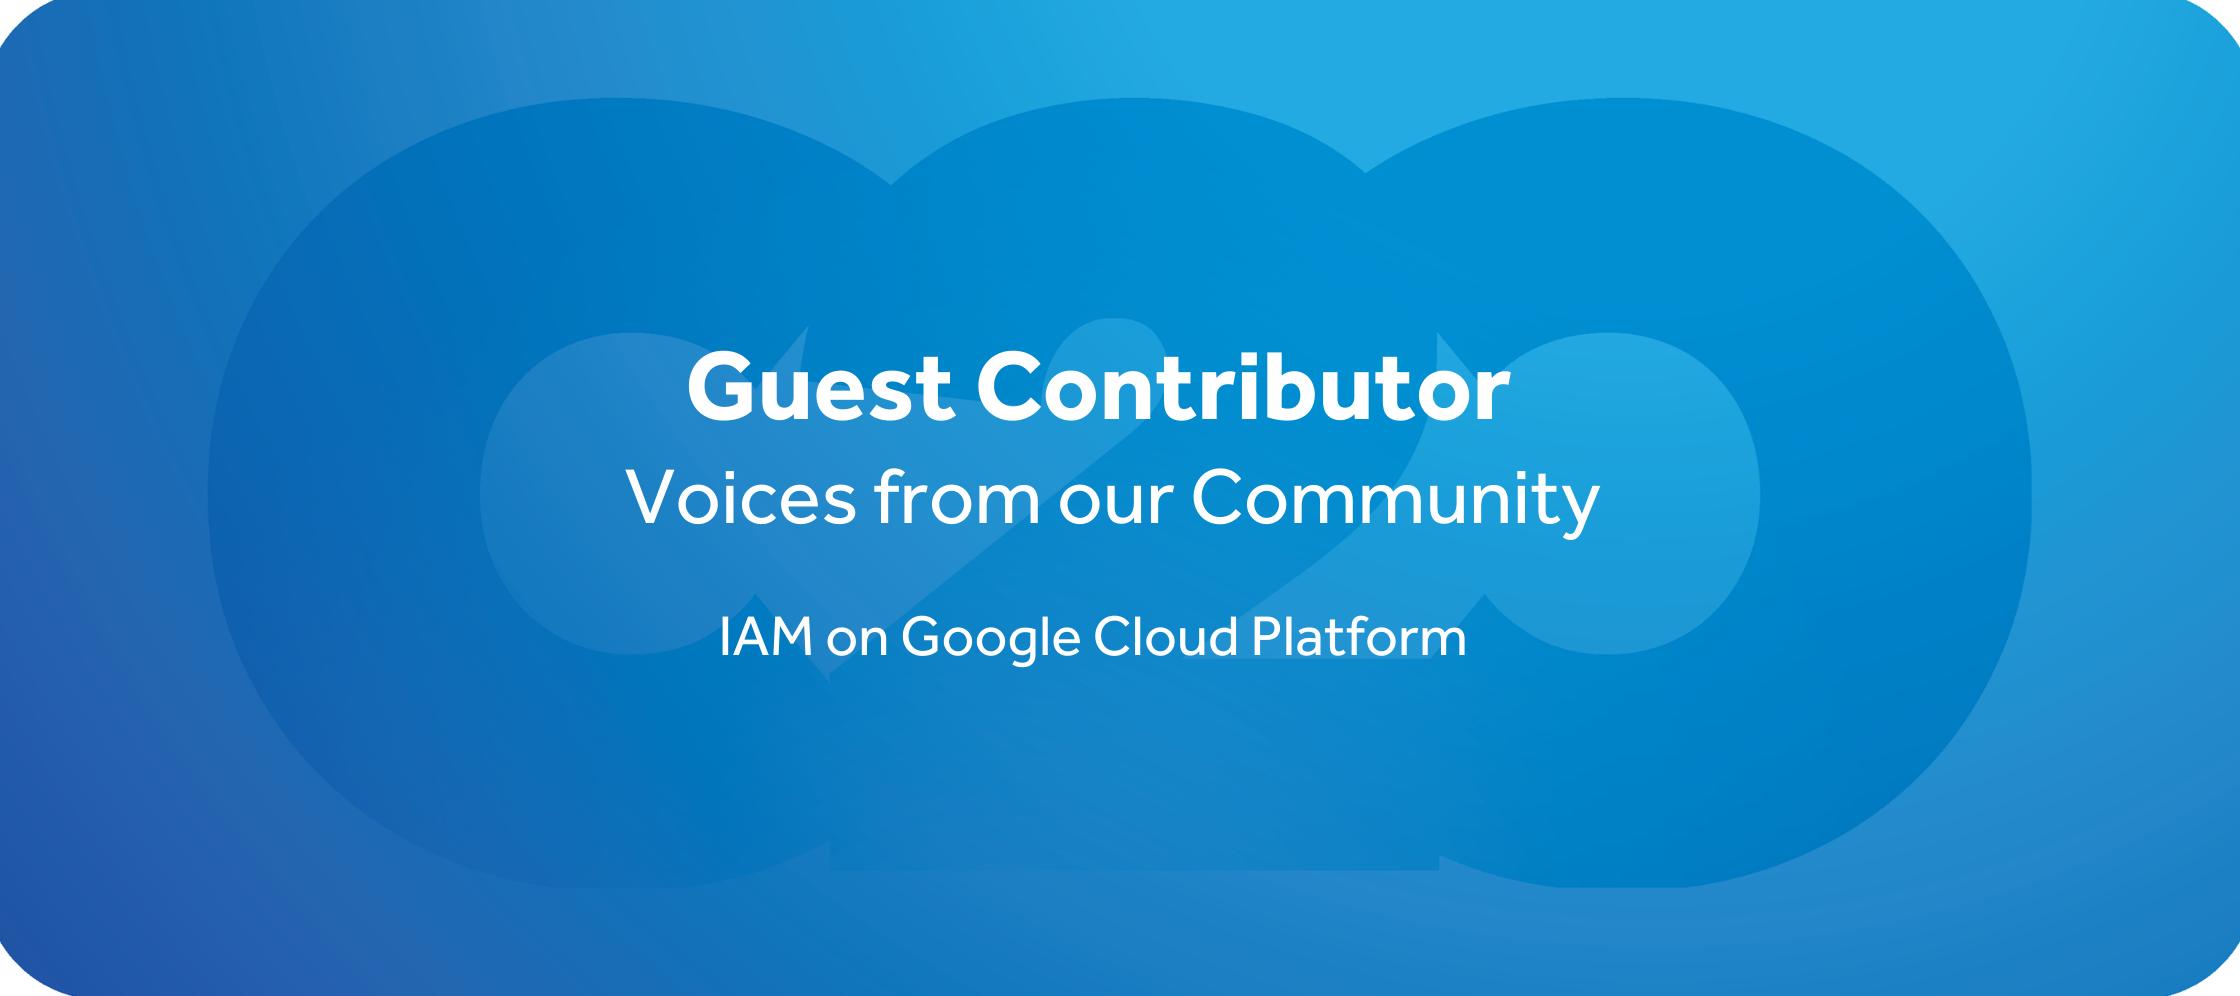 IAM on Google Cloud Platform